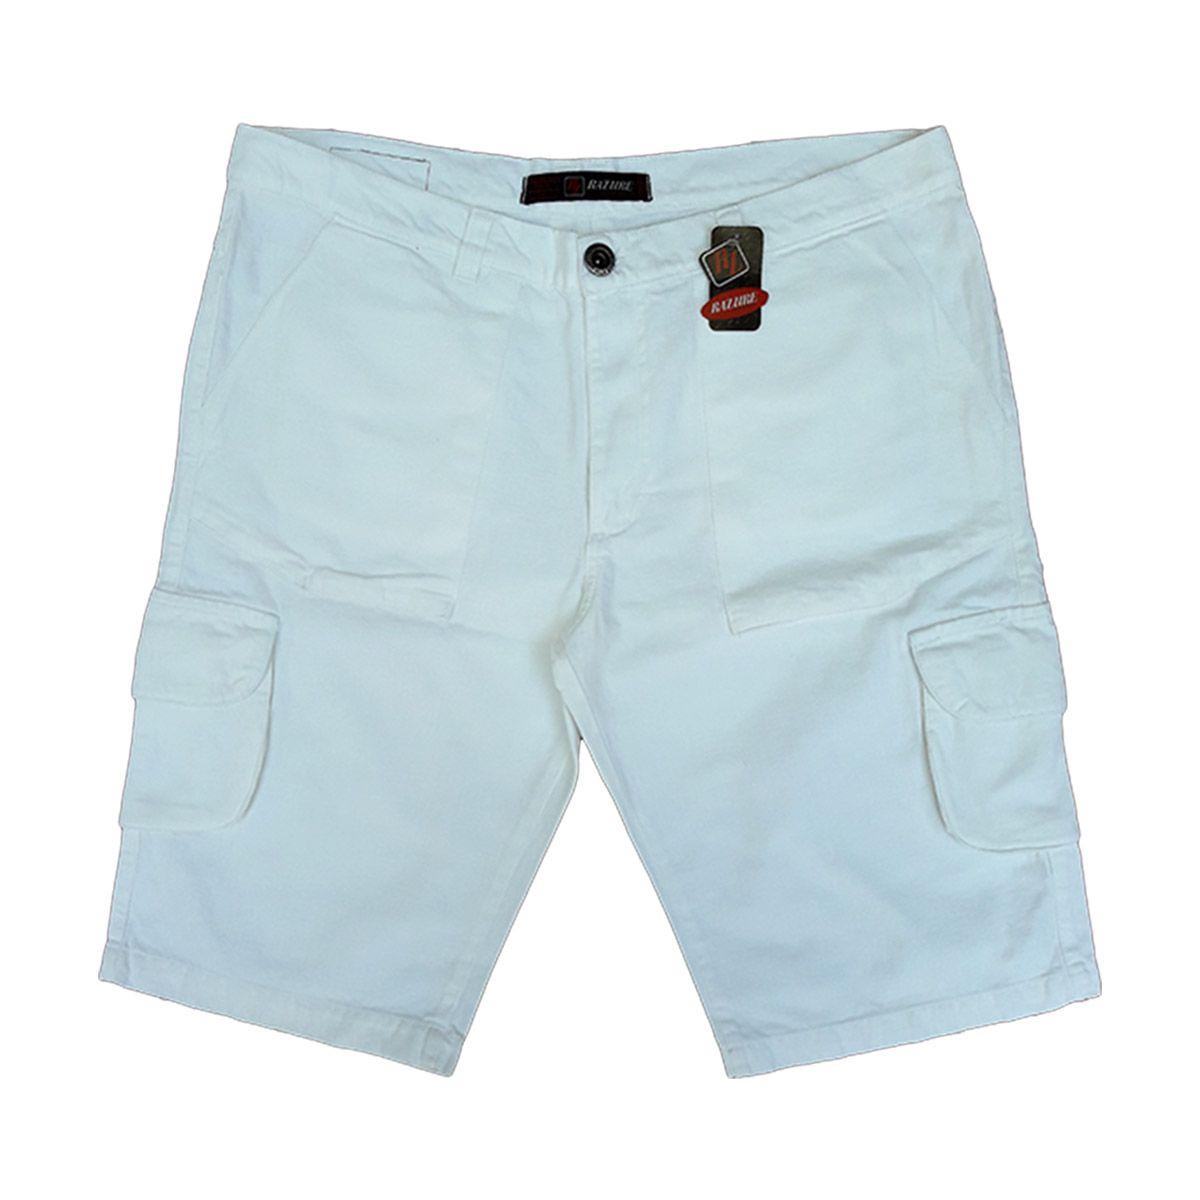 Bermuda Jeans Masculina Cargo Branca Tamanhos 36, 38 E 54